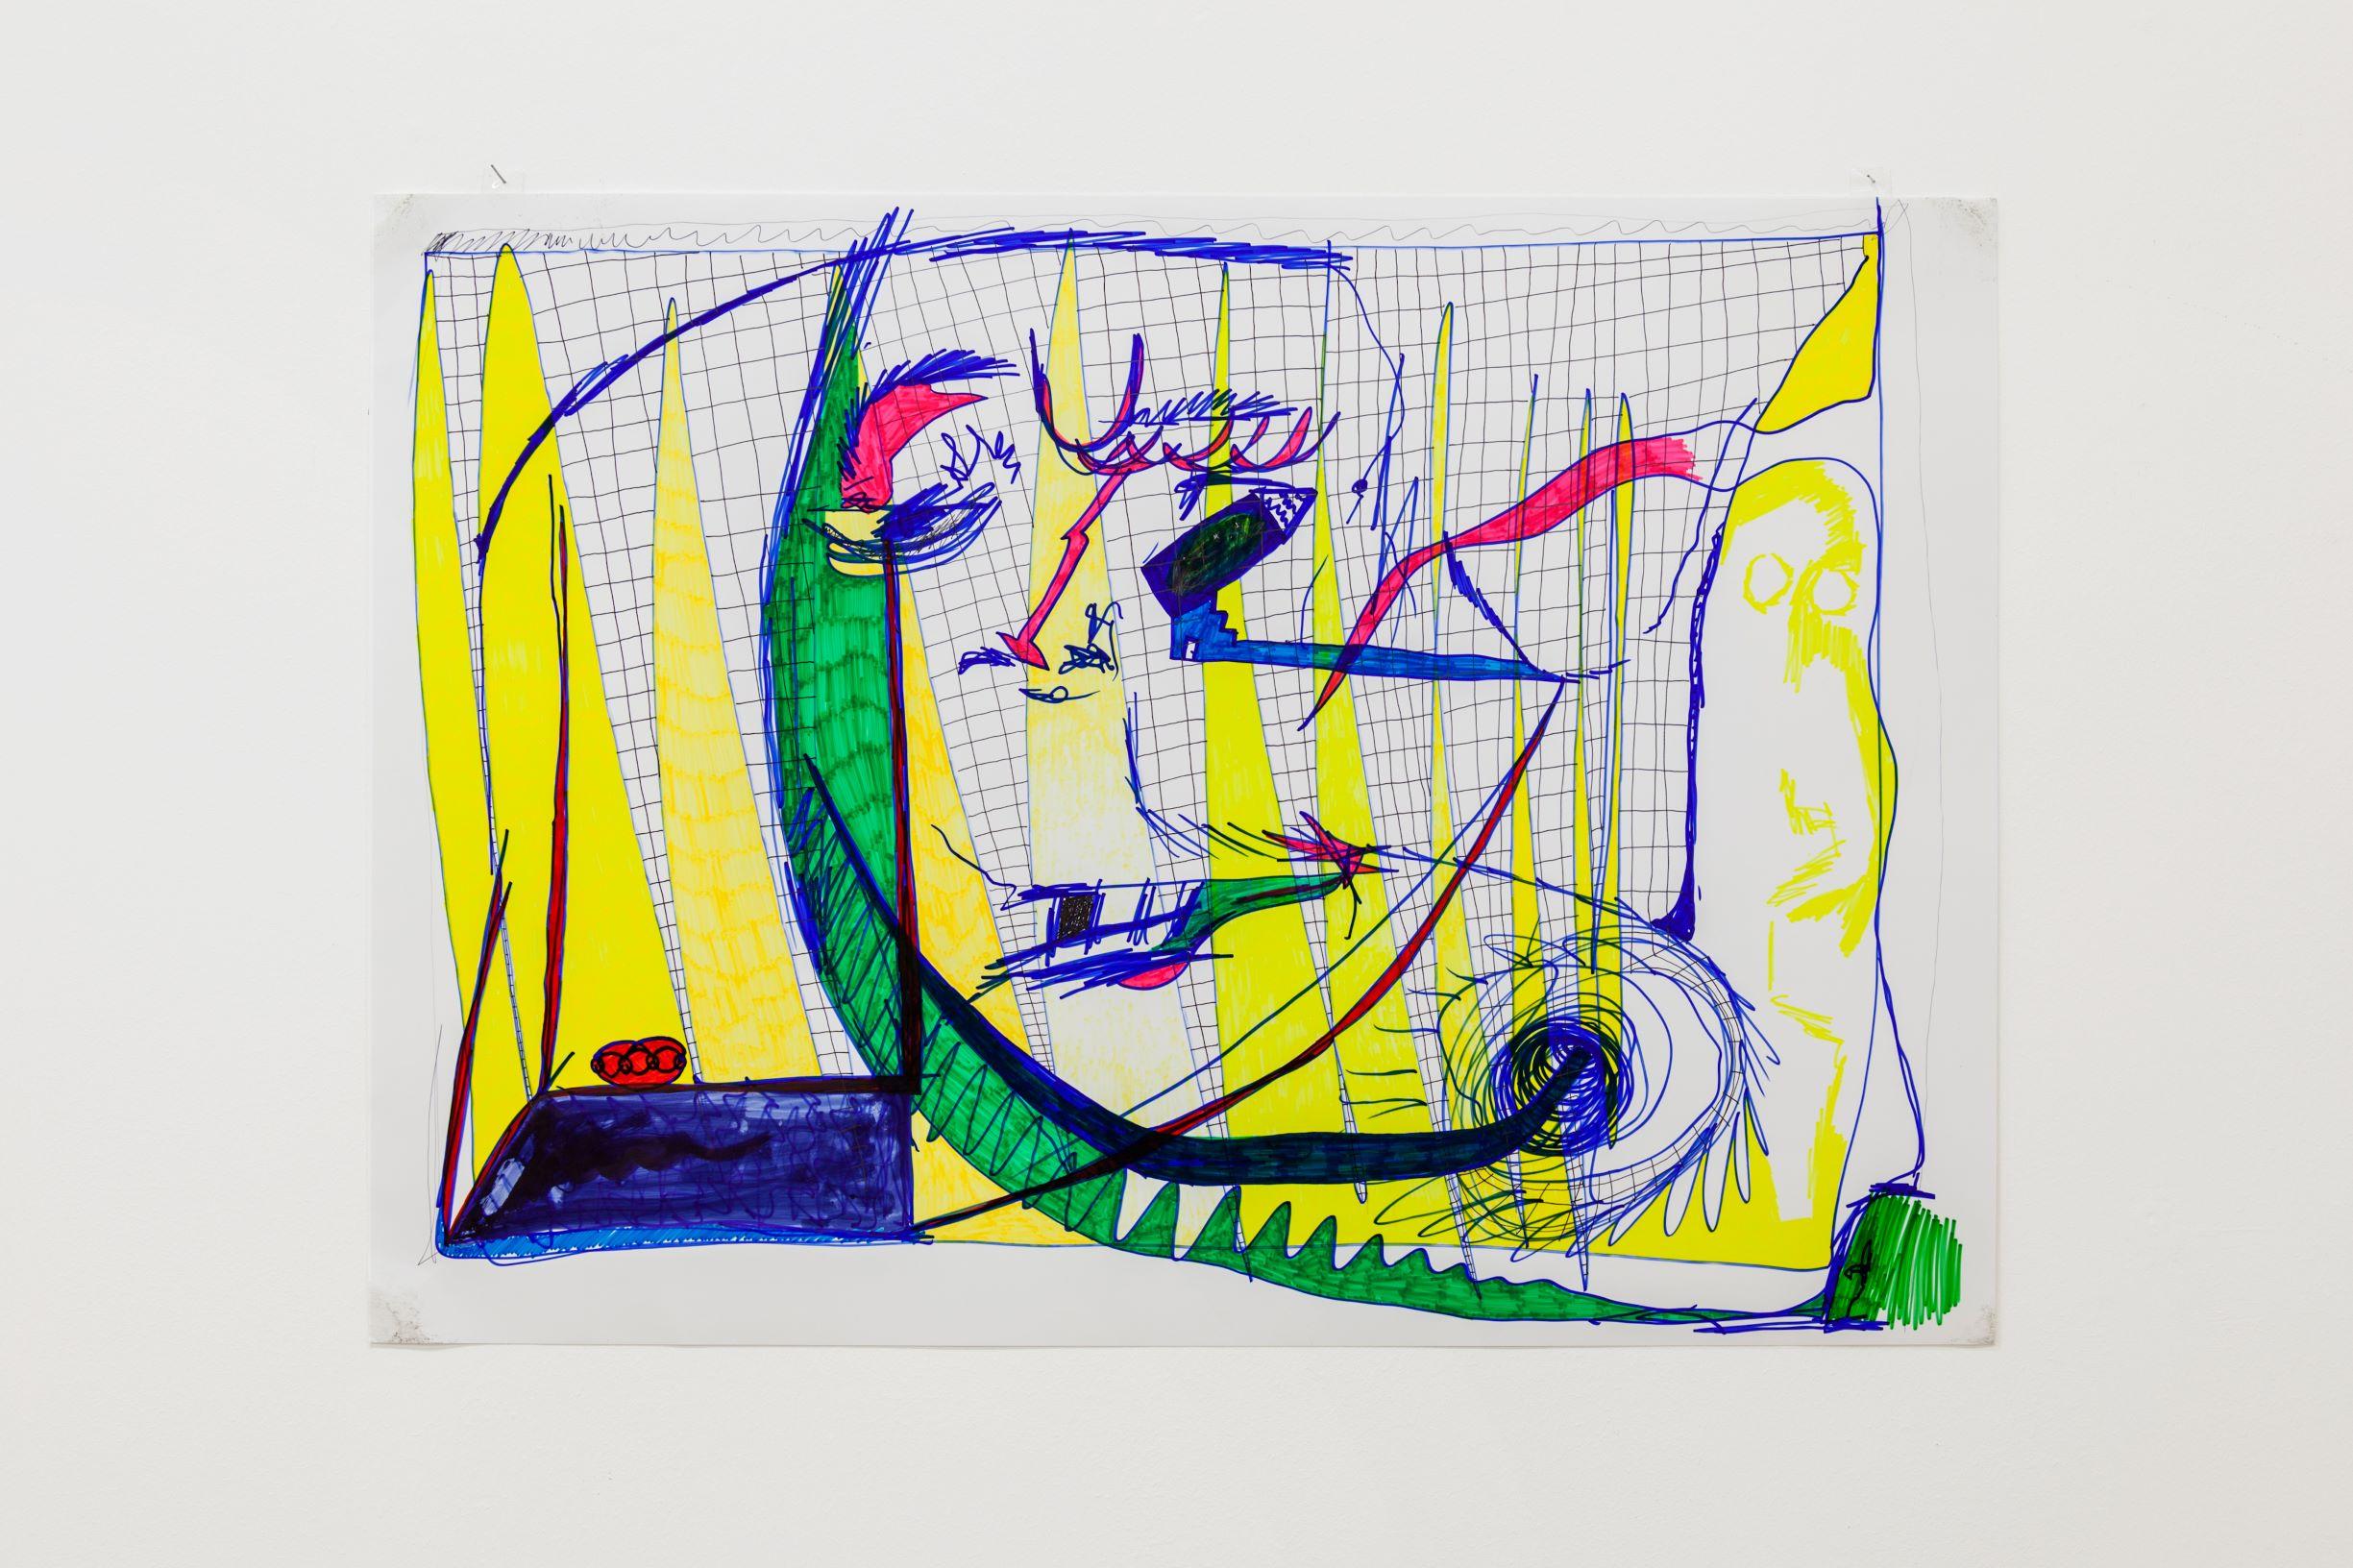 SCRIPTS, Linda Semadeni, Kirchgasse ©Björn Allemann, Erinnerung ans Hirn, 2019, Marker on photo paper, 42 x 59.5 cm.